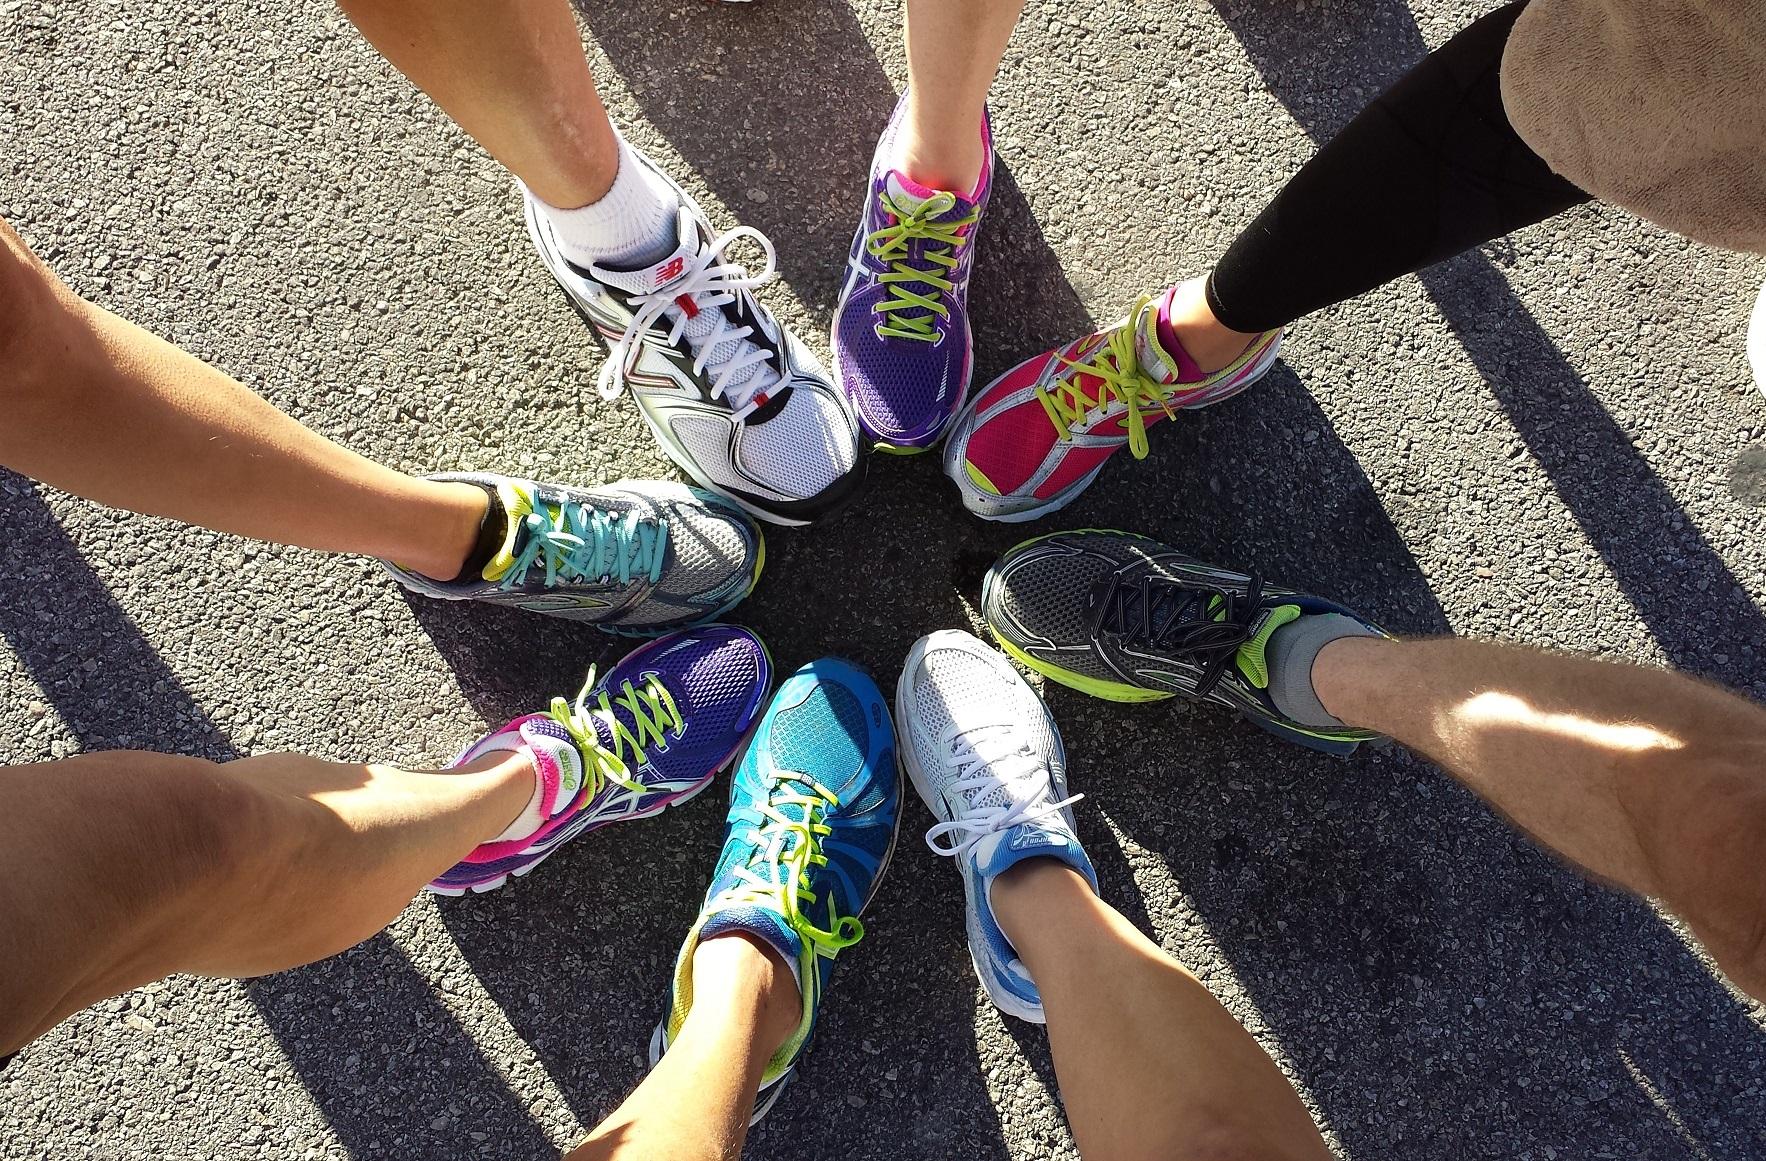 Gina-Feet-Pic_1710963126 (1)